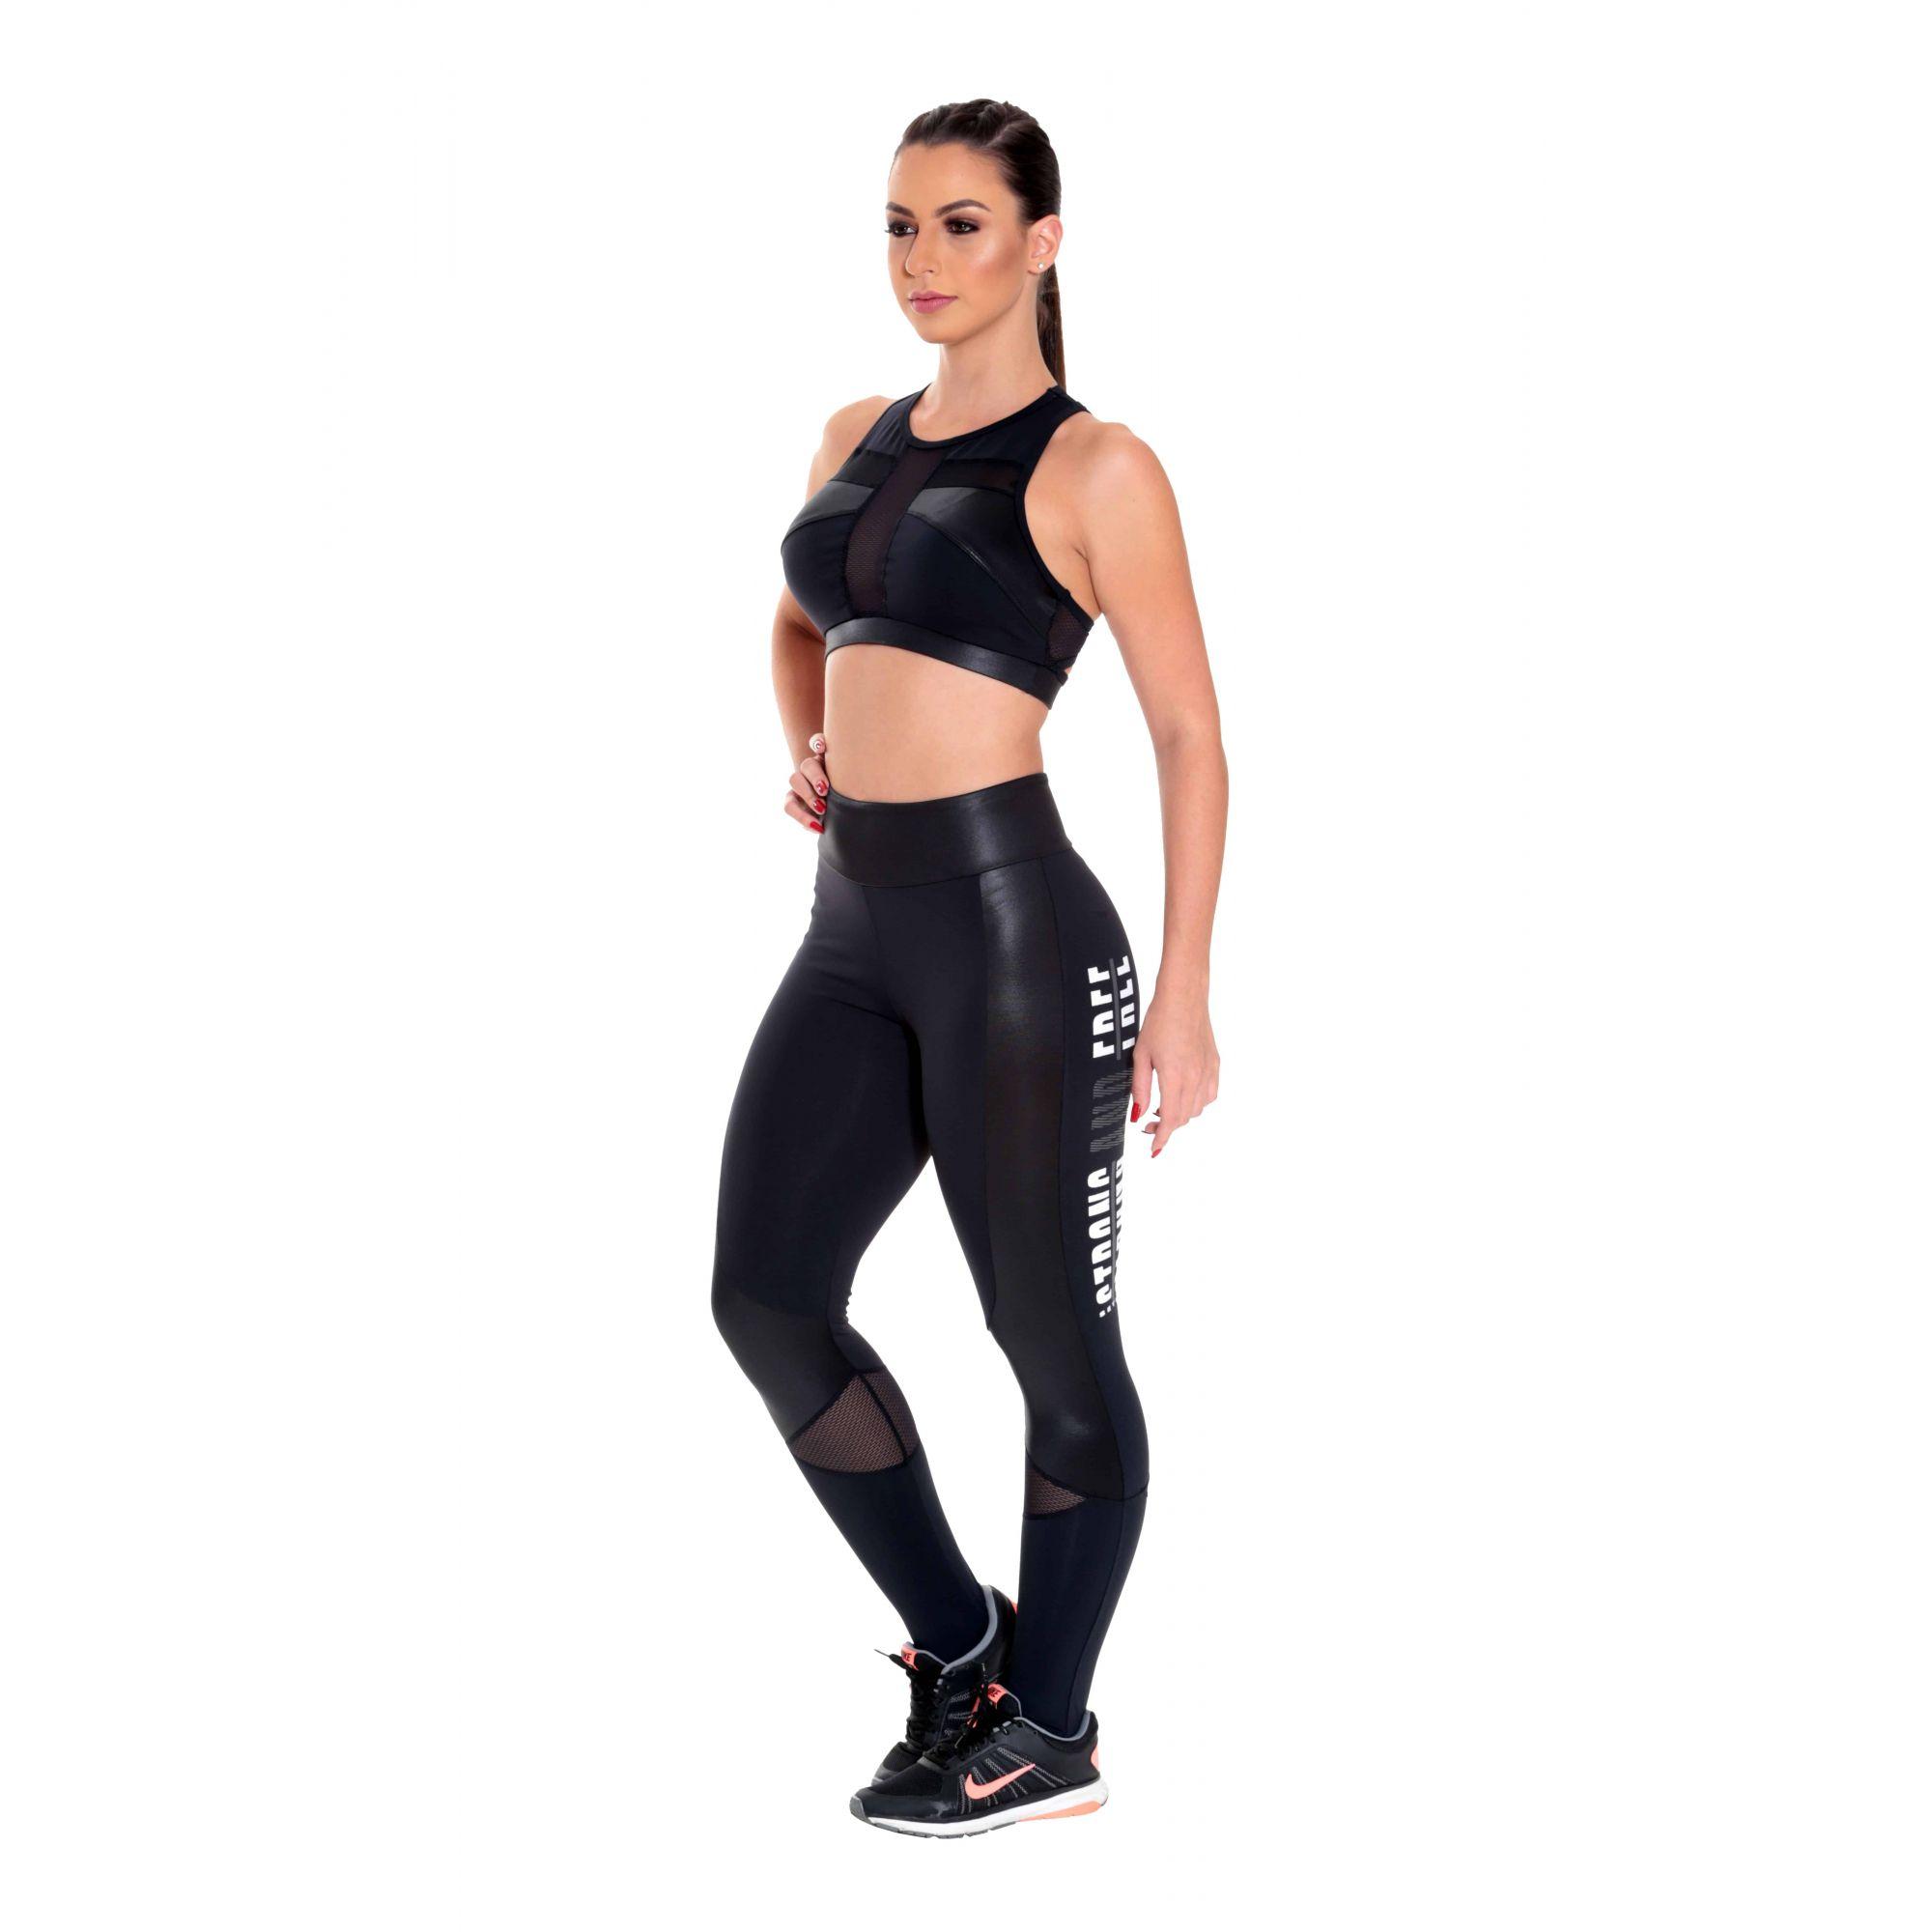 Conjunto Fitness Feminino Legging/top Roupa de Academia